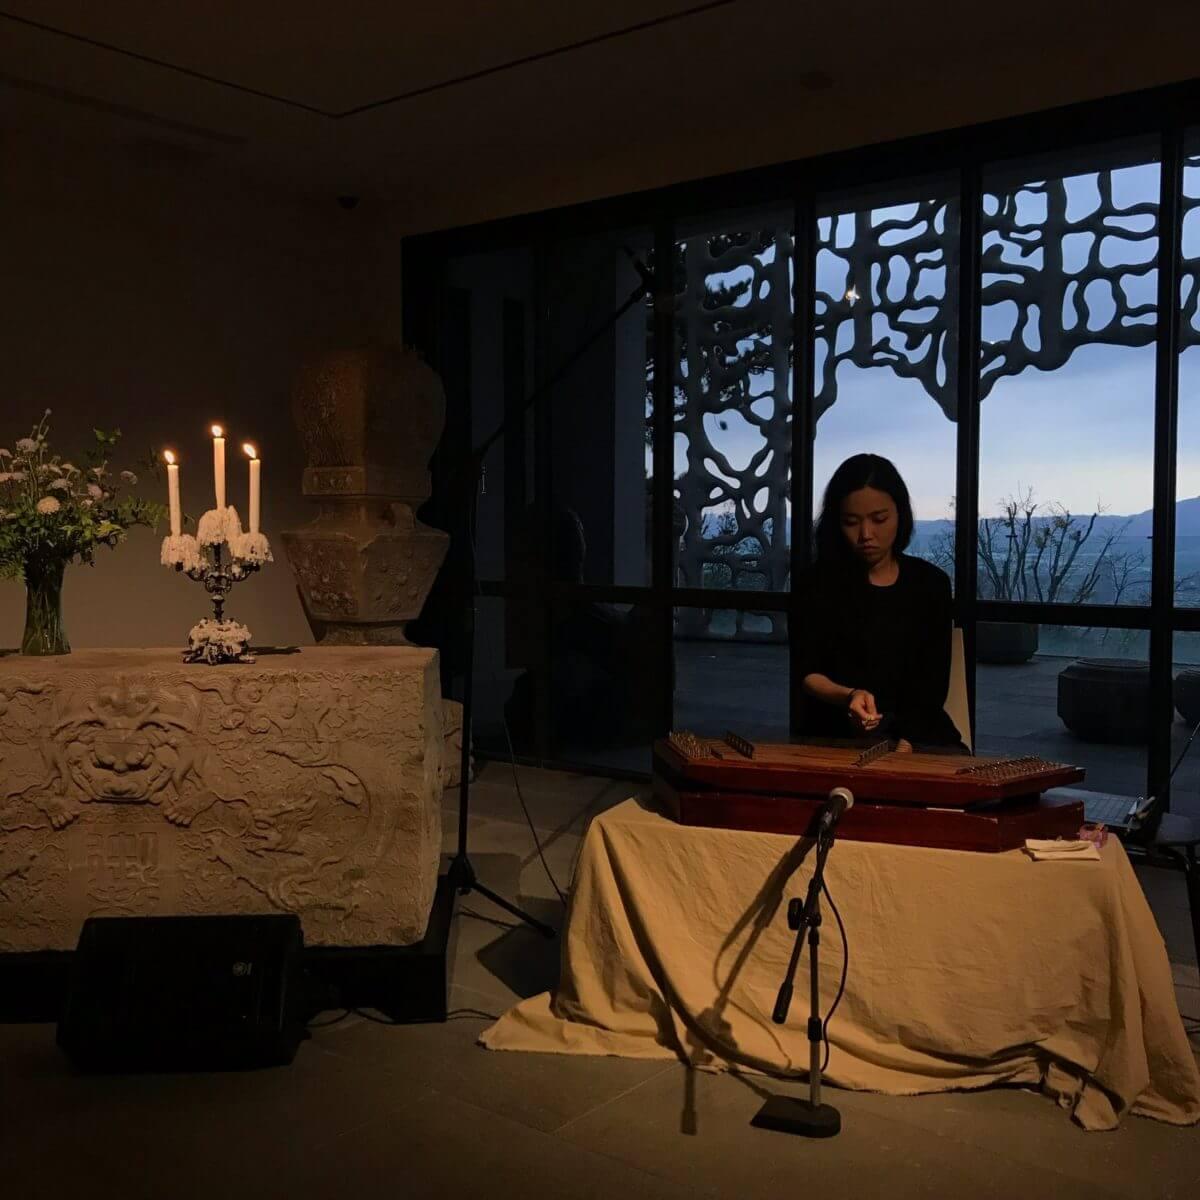 Garden 91 ~ 我在絕佳的療癒系景點聆賞了療癒人心的音樂!